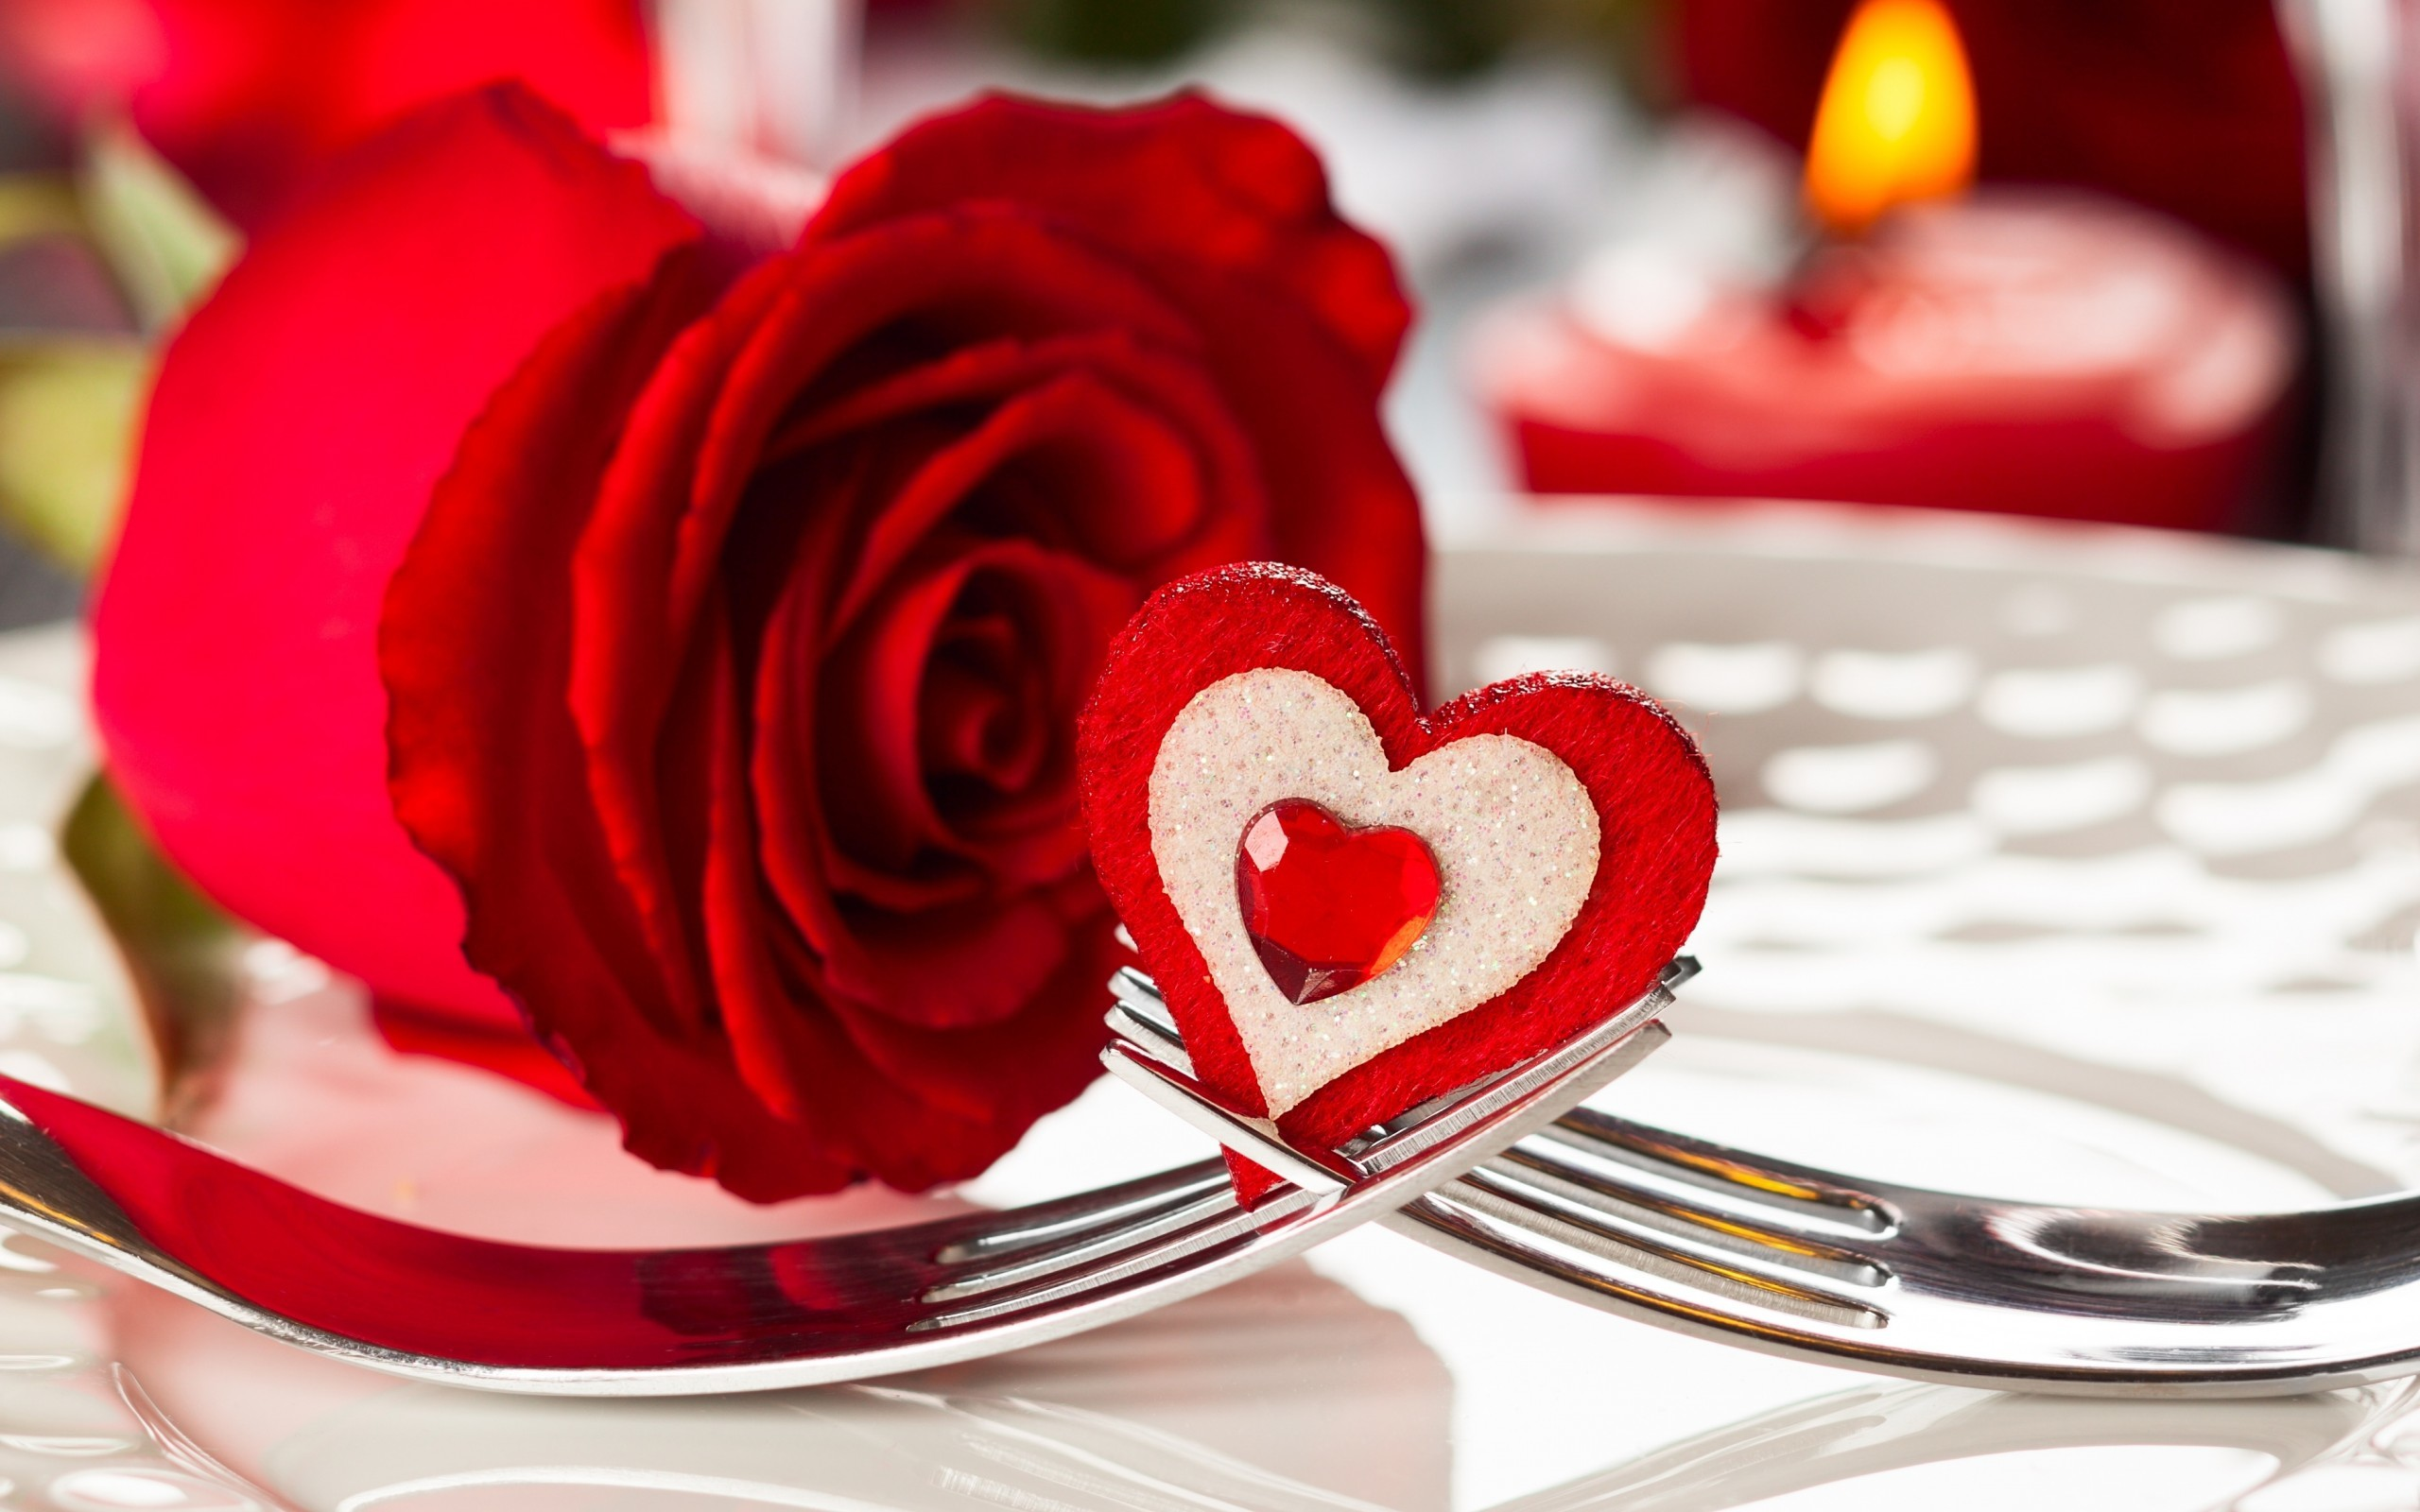 Red Rose Heart Wallpaper